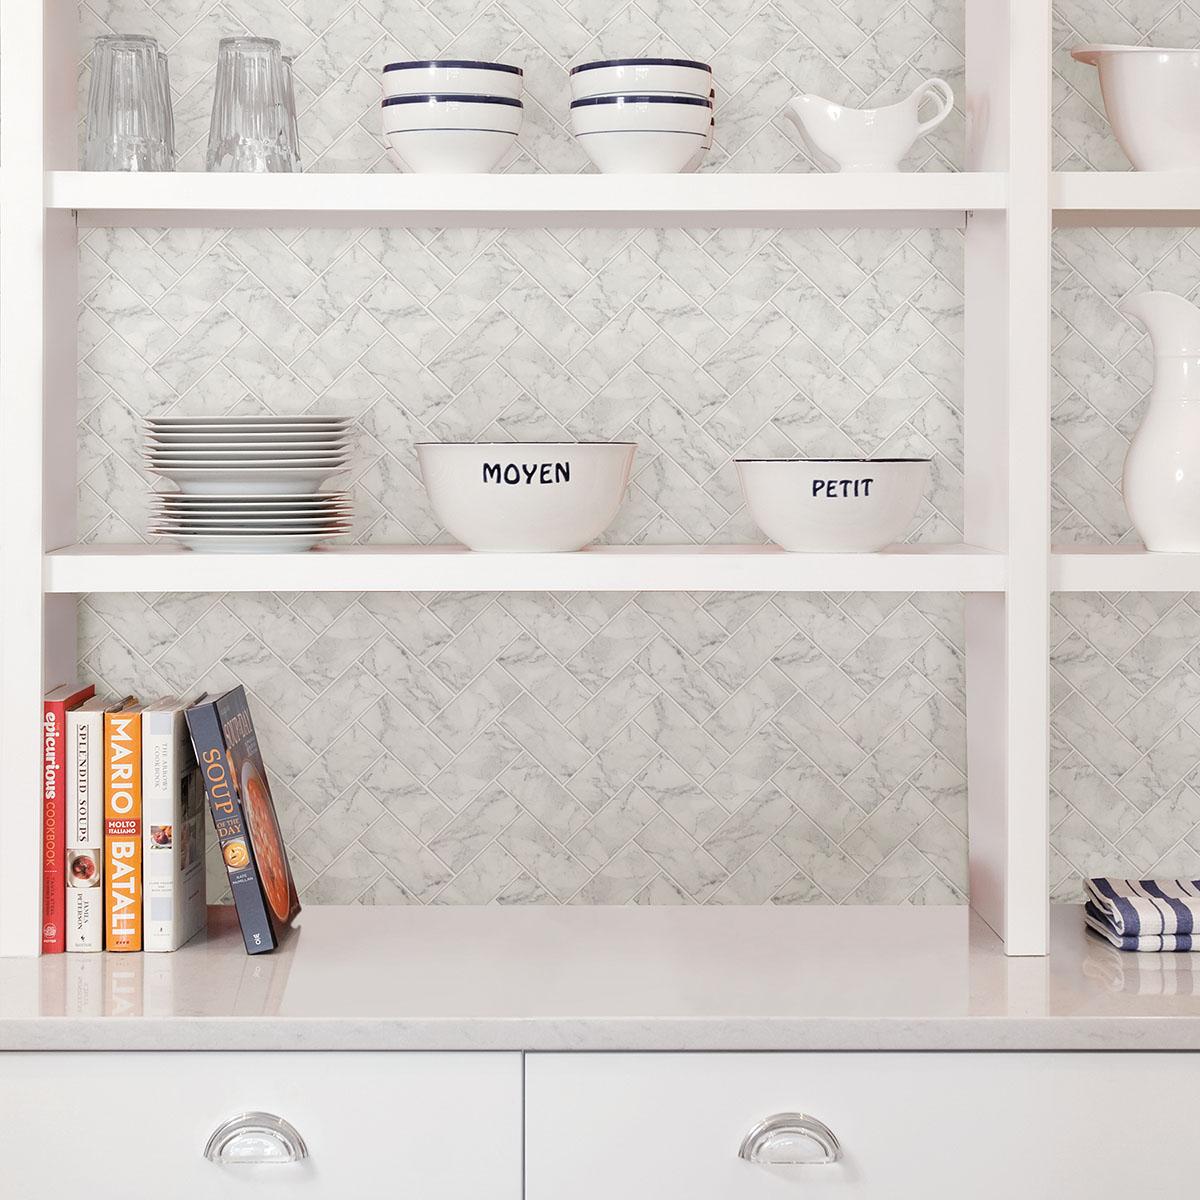 Herringbone Peel & Stick Marble Adhesive Backsplash Wall Tiles